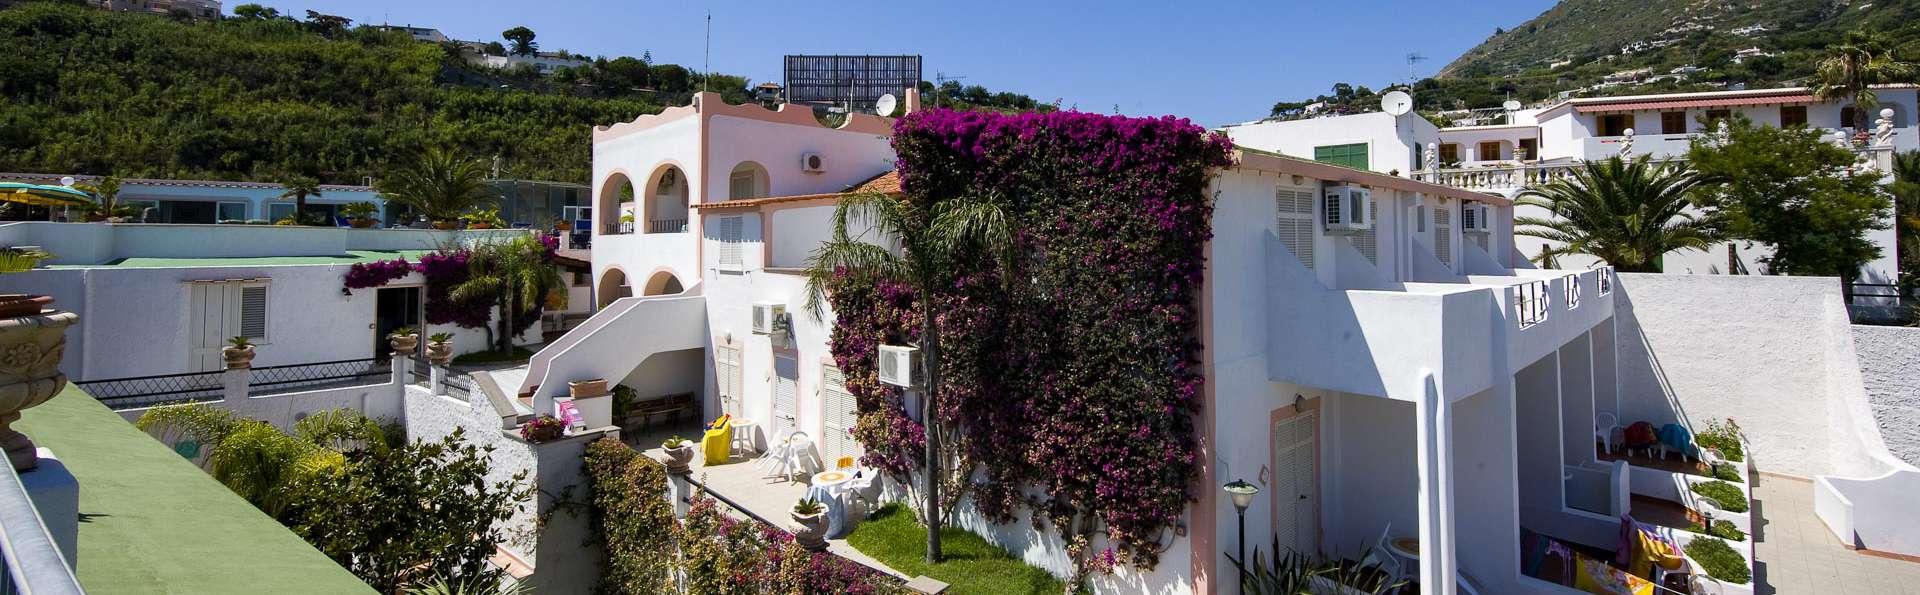 Hotel Castiglione Village - EDIT_EXTERIOR_06.jpg